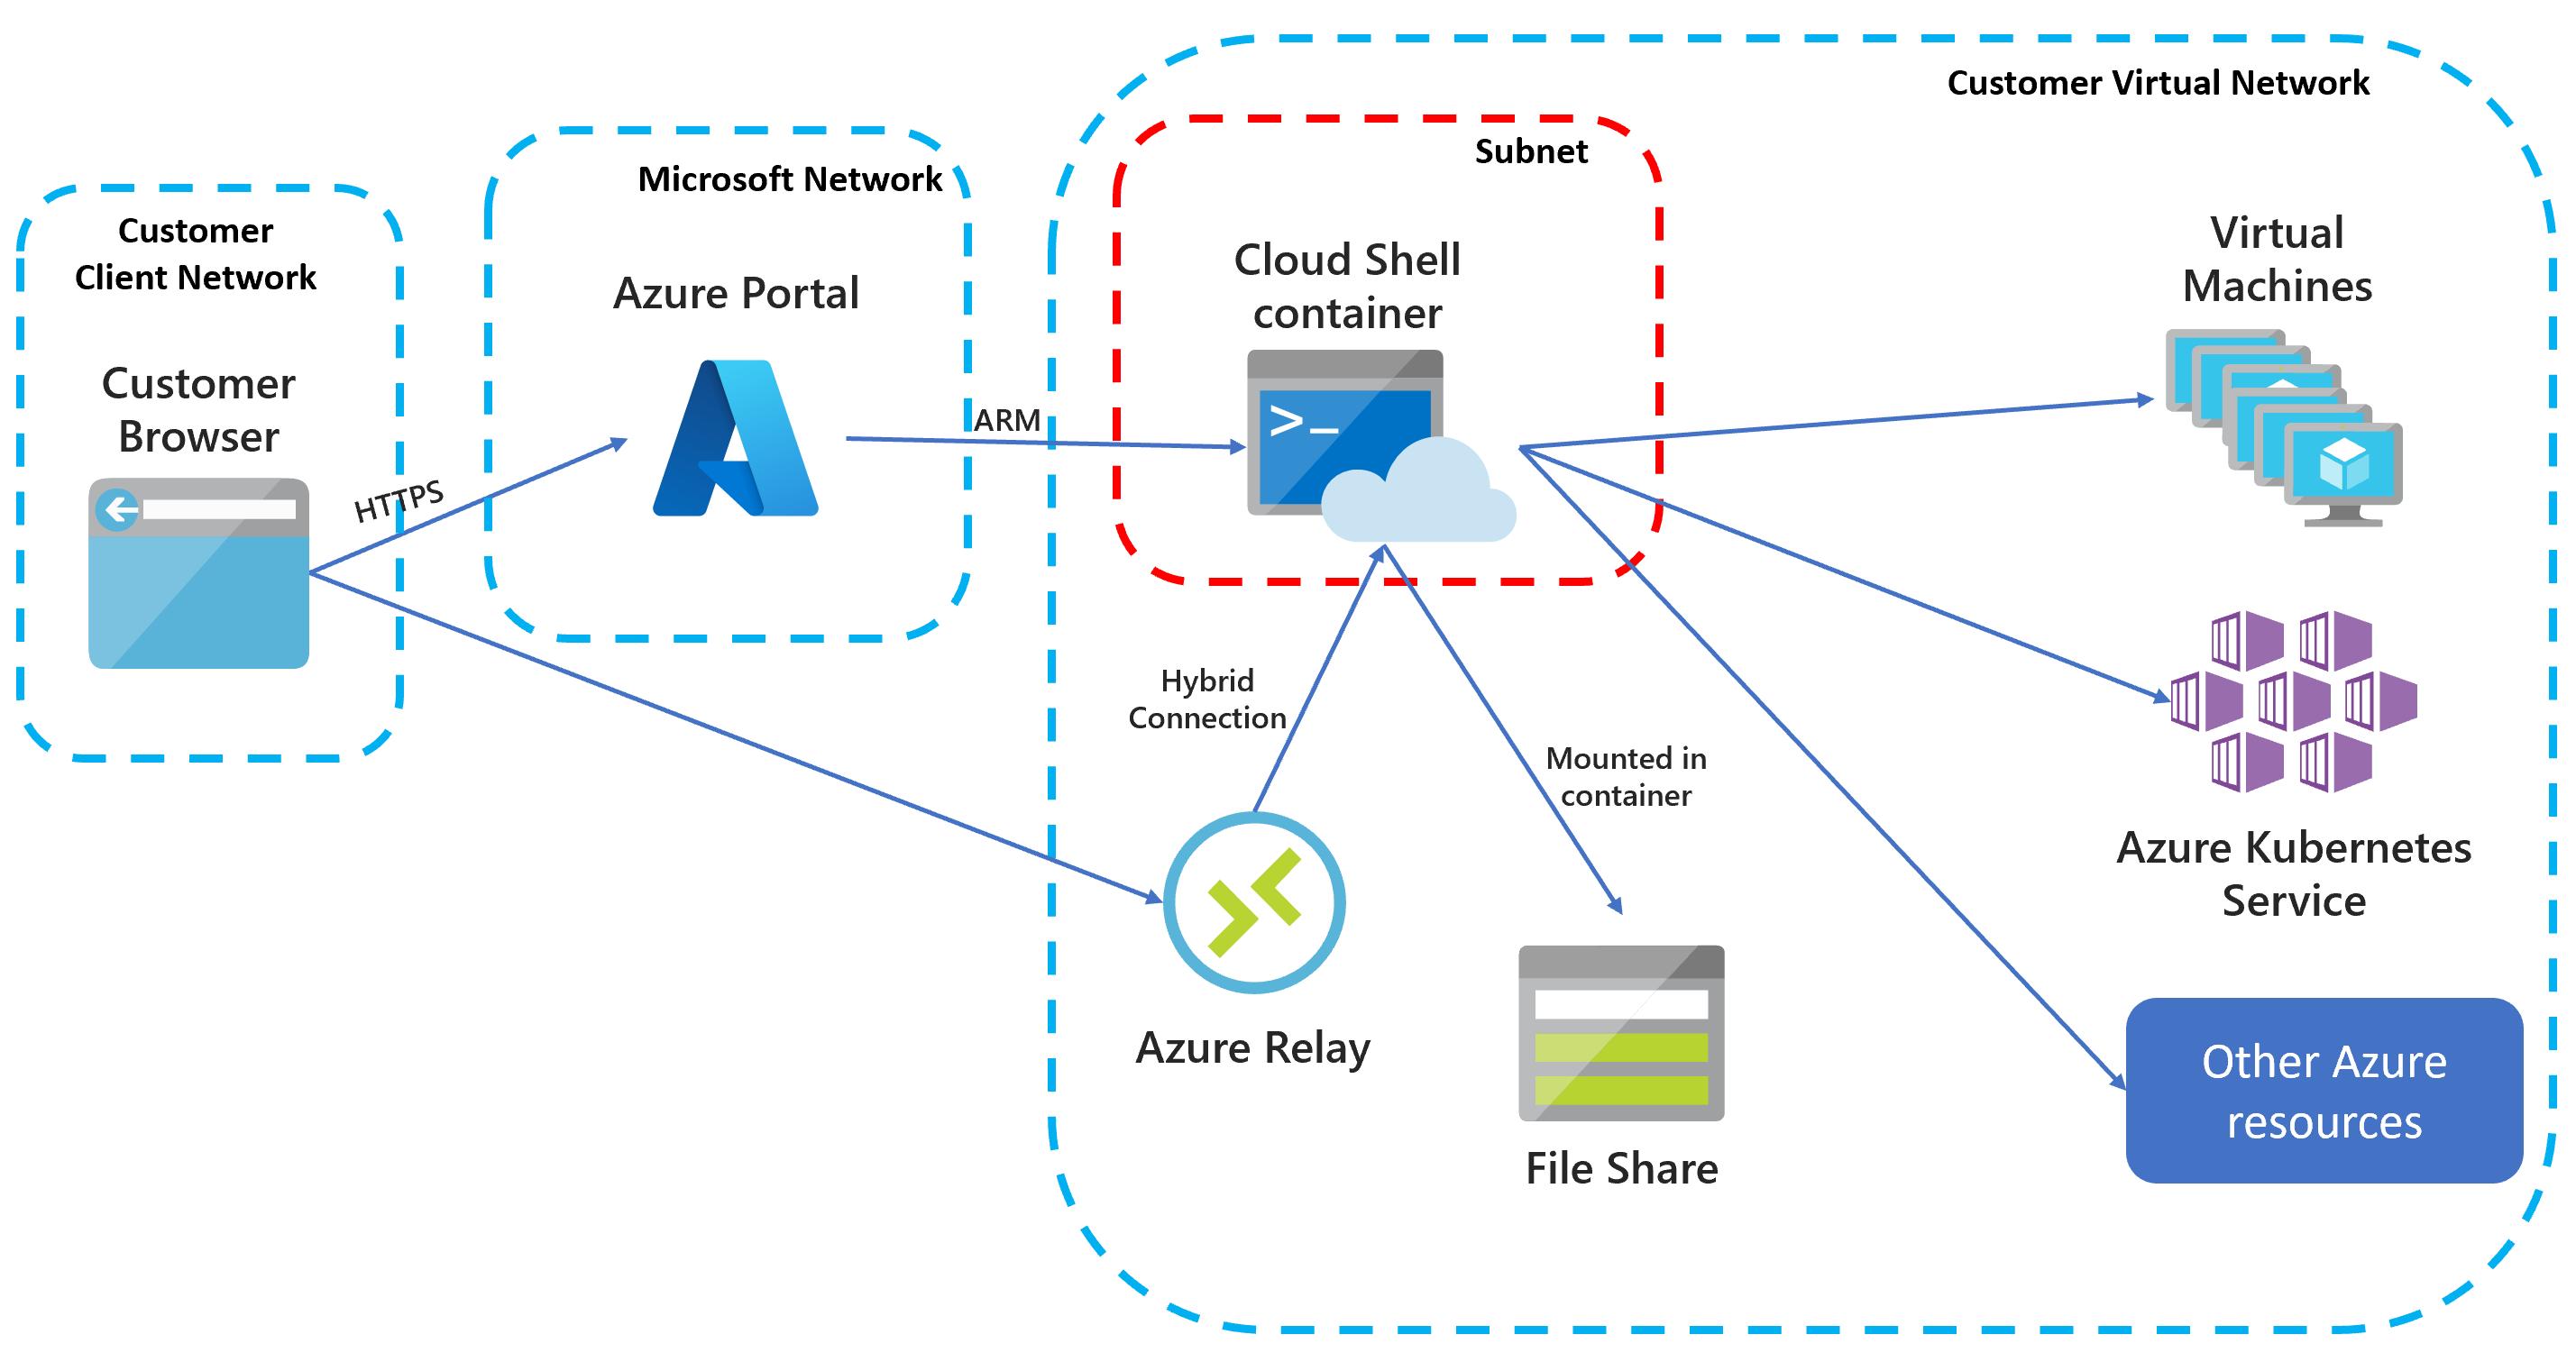 Cloud Shell 分離 VNET アーキテクチャを示す図。